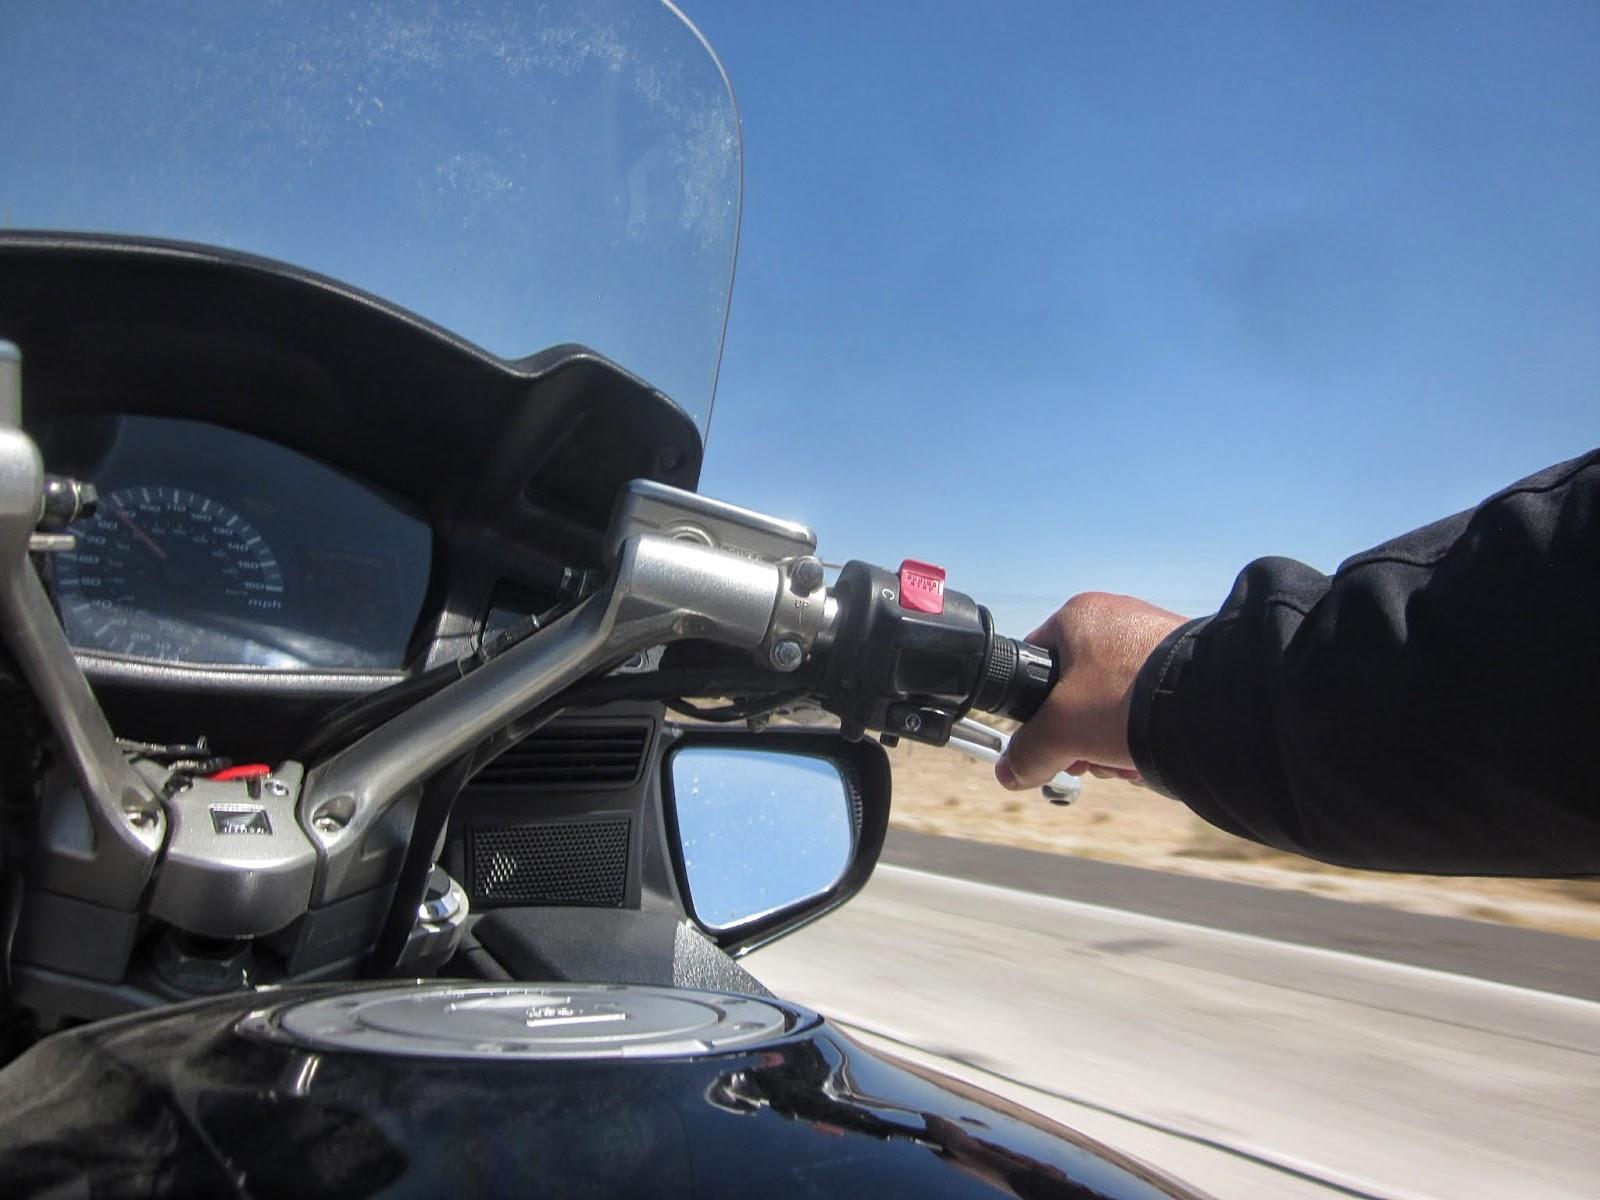 2014 St1300 Honda Motorcycle html Autos Post